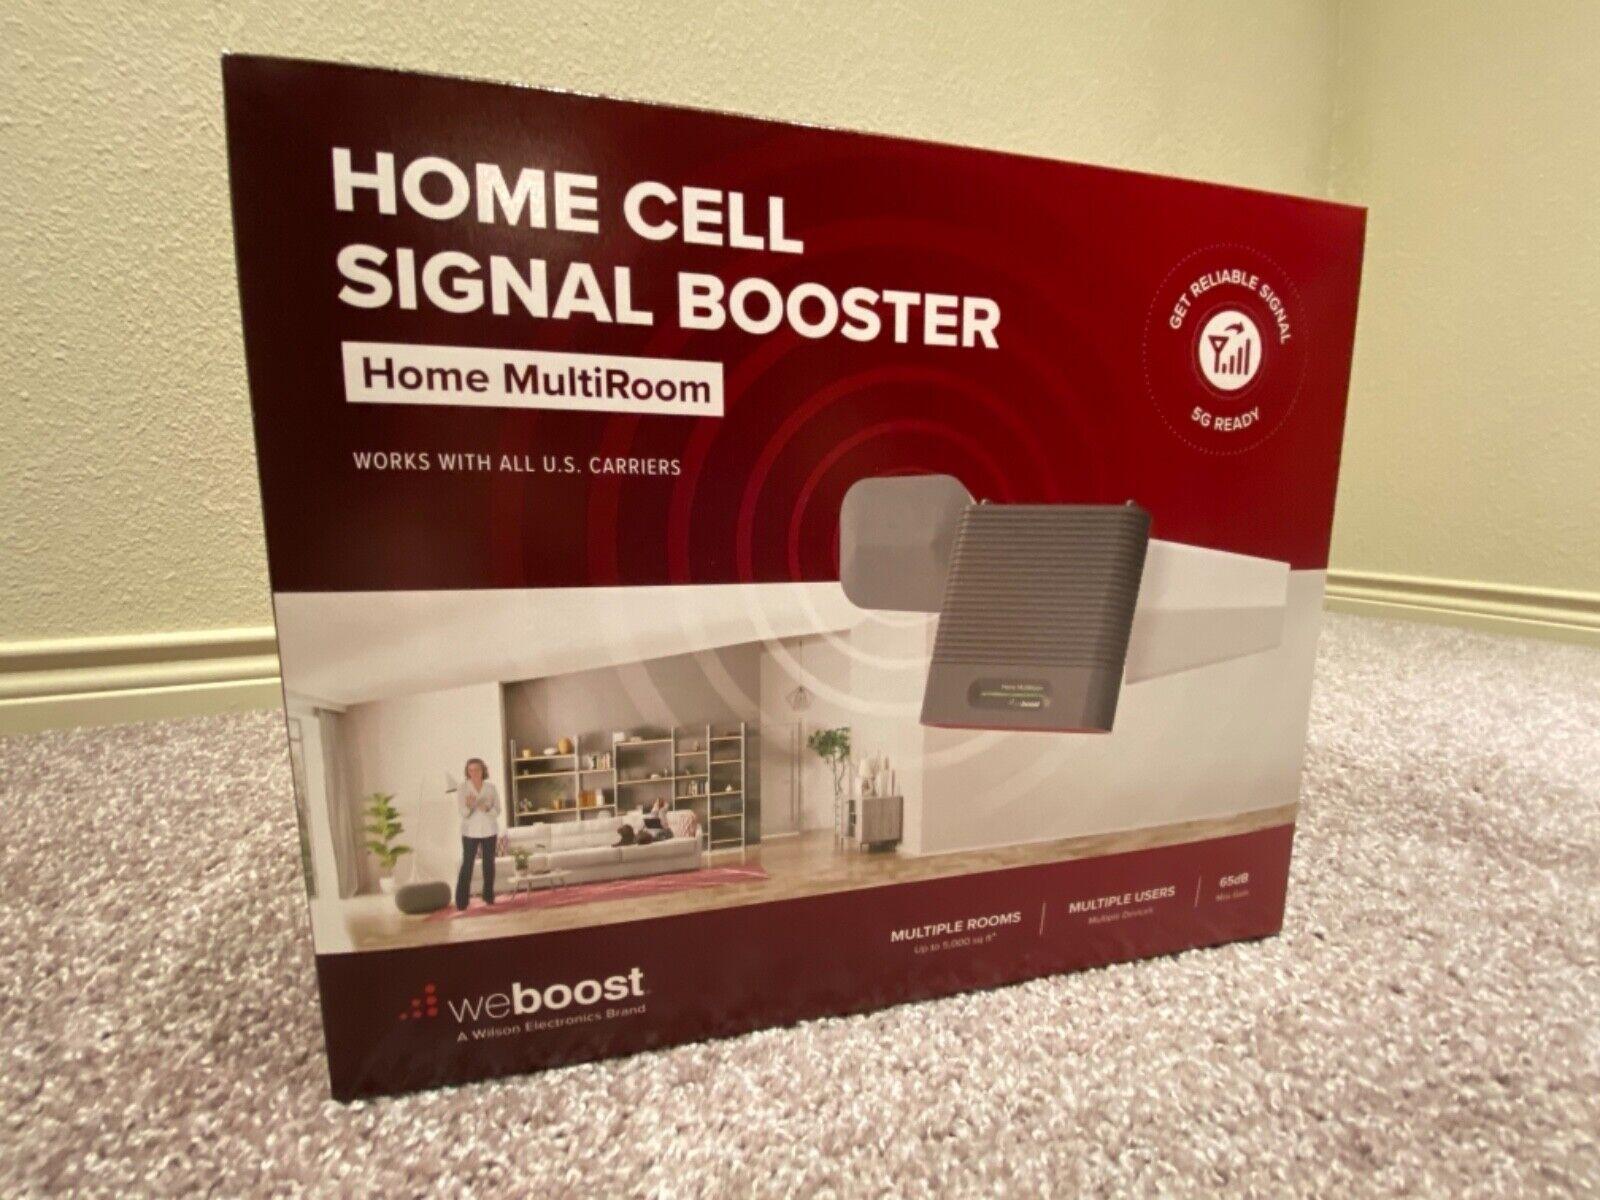 home multiroom cellular signal booster 470144 nib